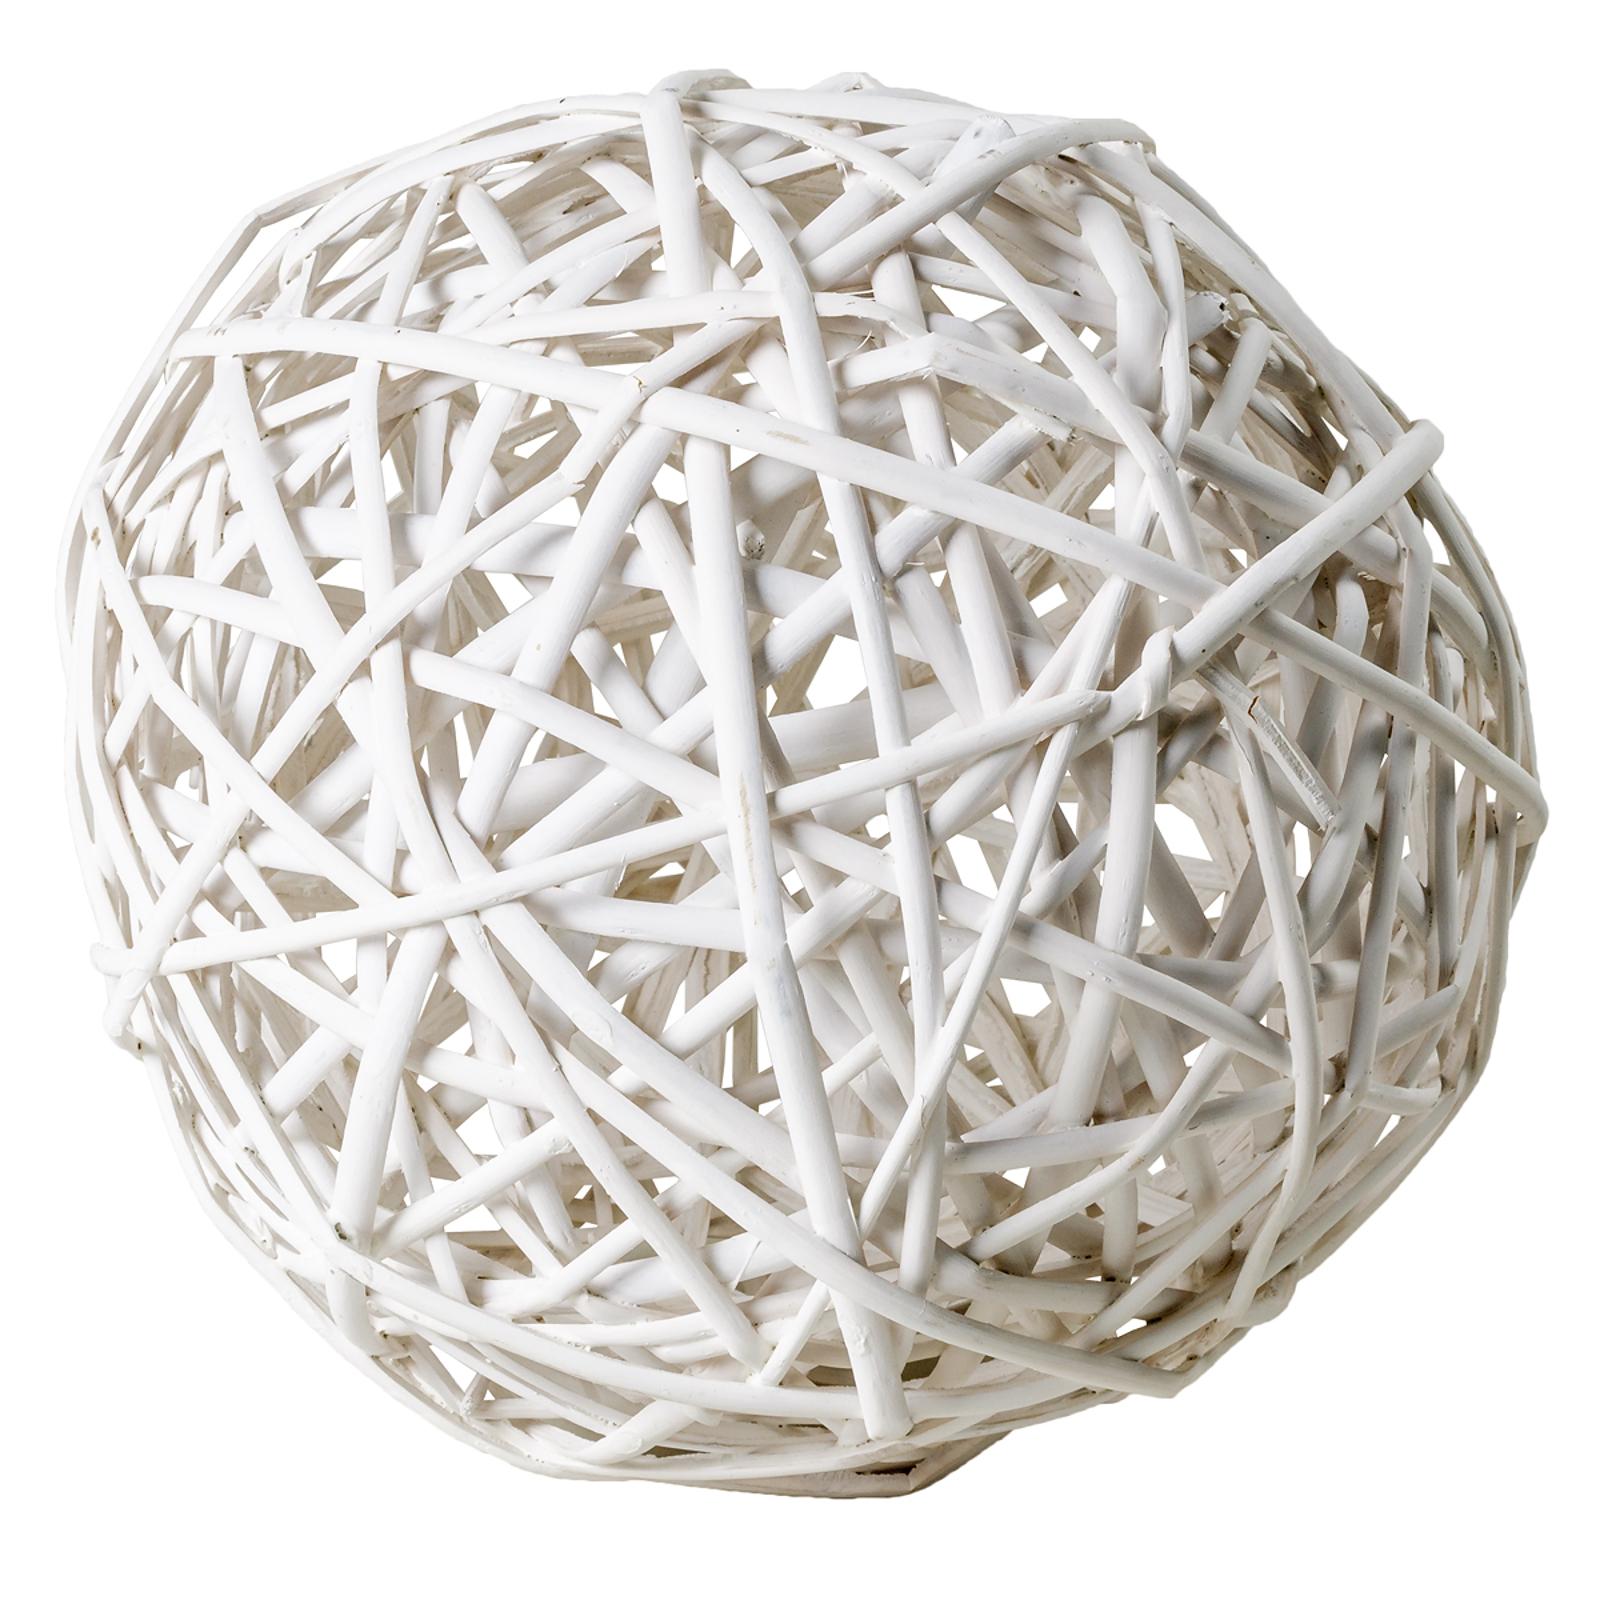 1 weidenball 25 cm weidenkugel dekokugel als dekoration - Dekoration basteln ...